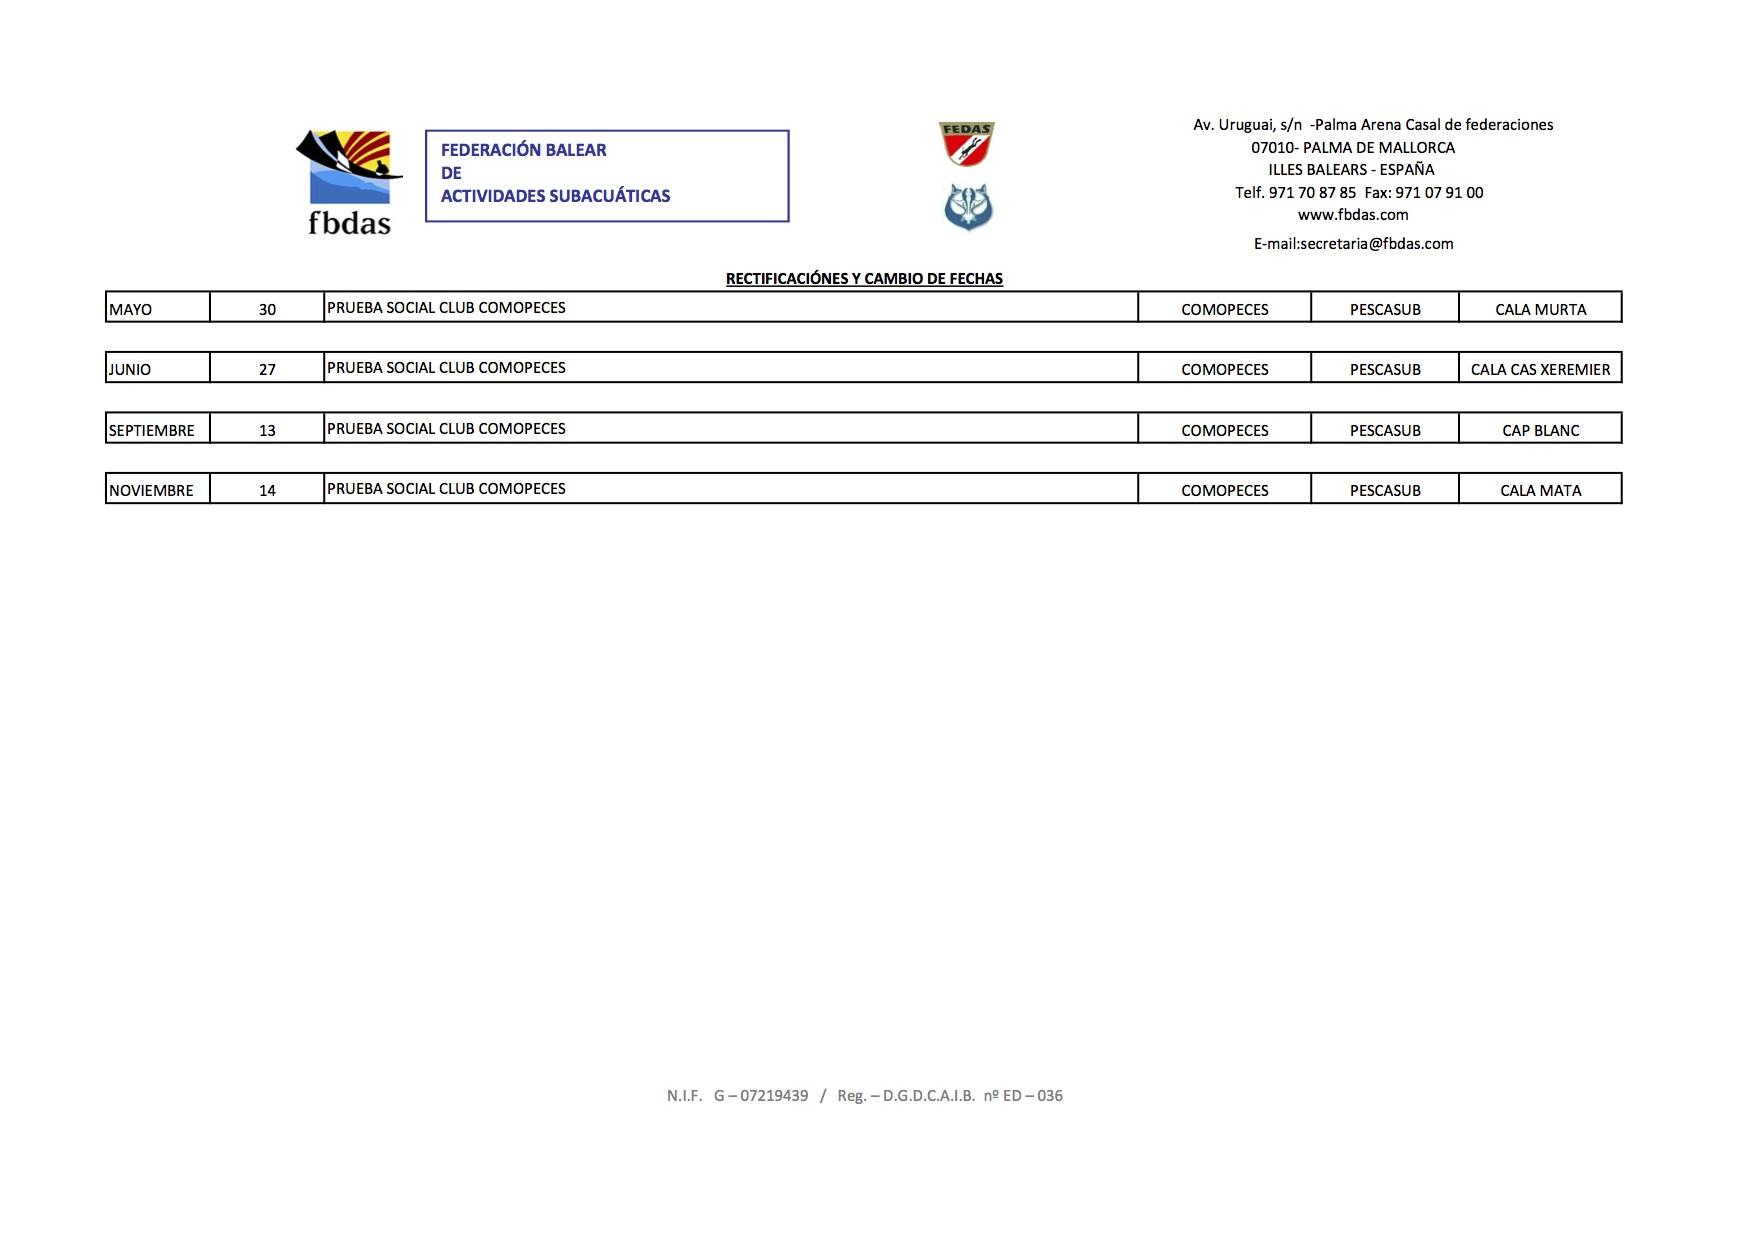 CALENDARIO 2015 GENERArLr ULTIMO